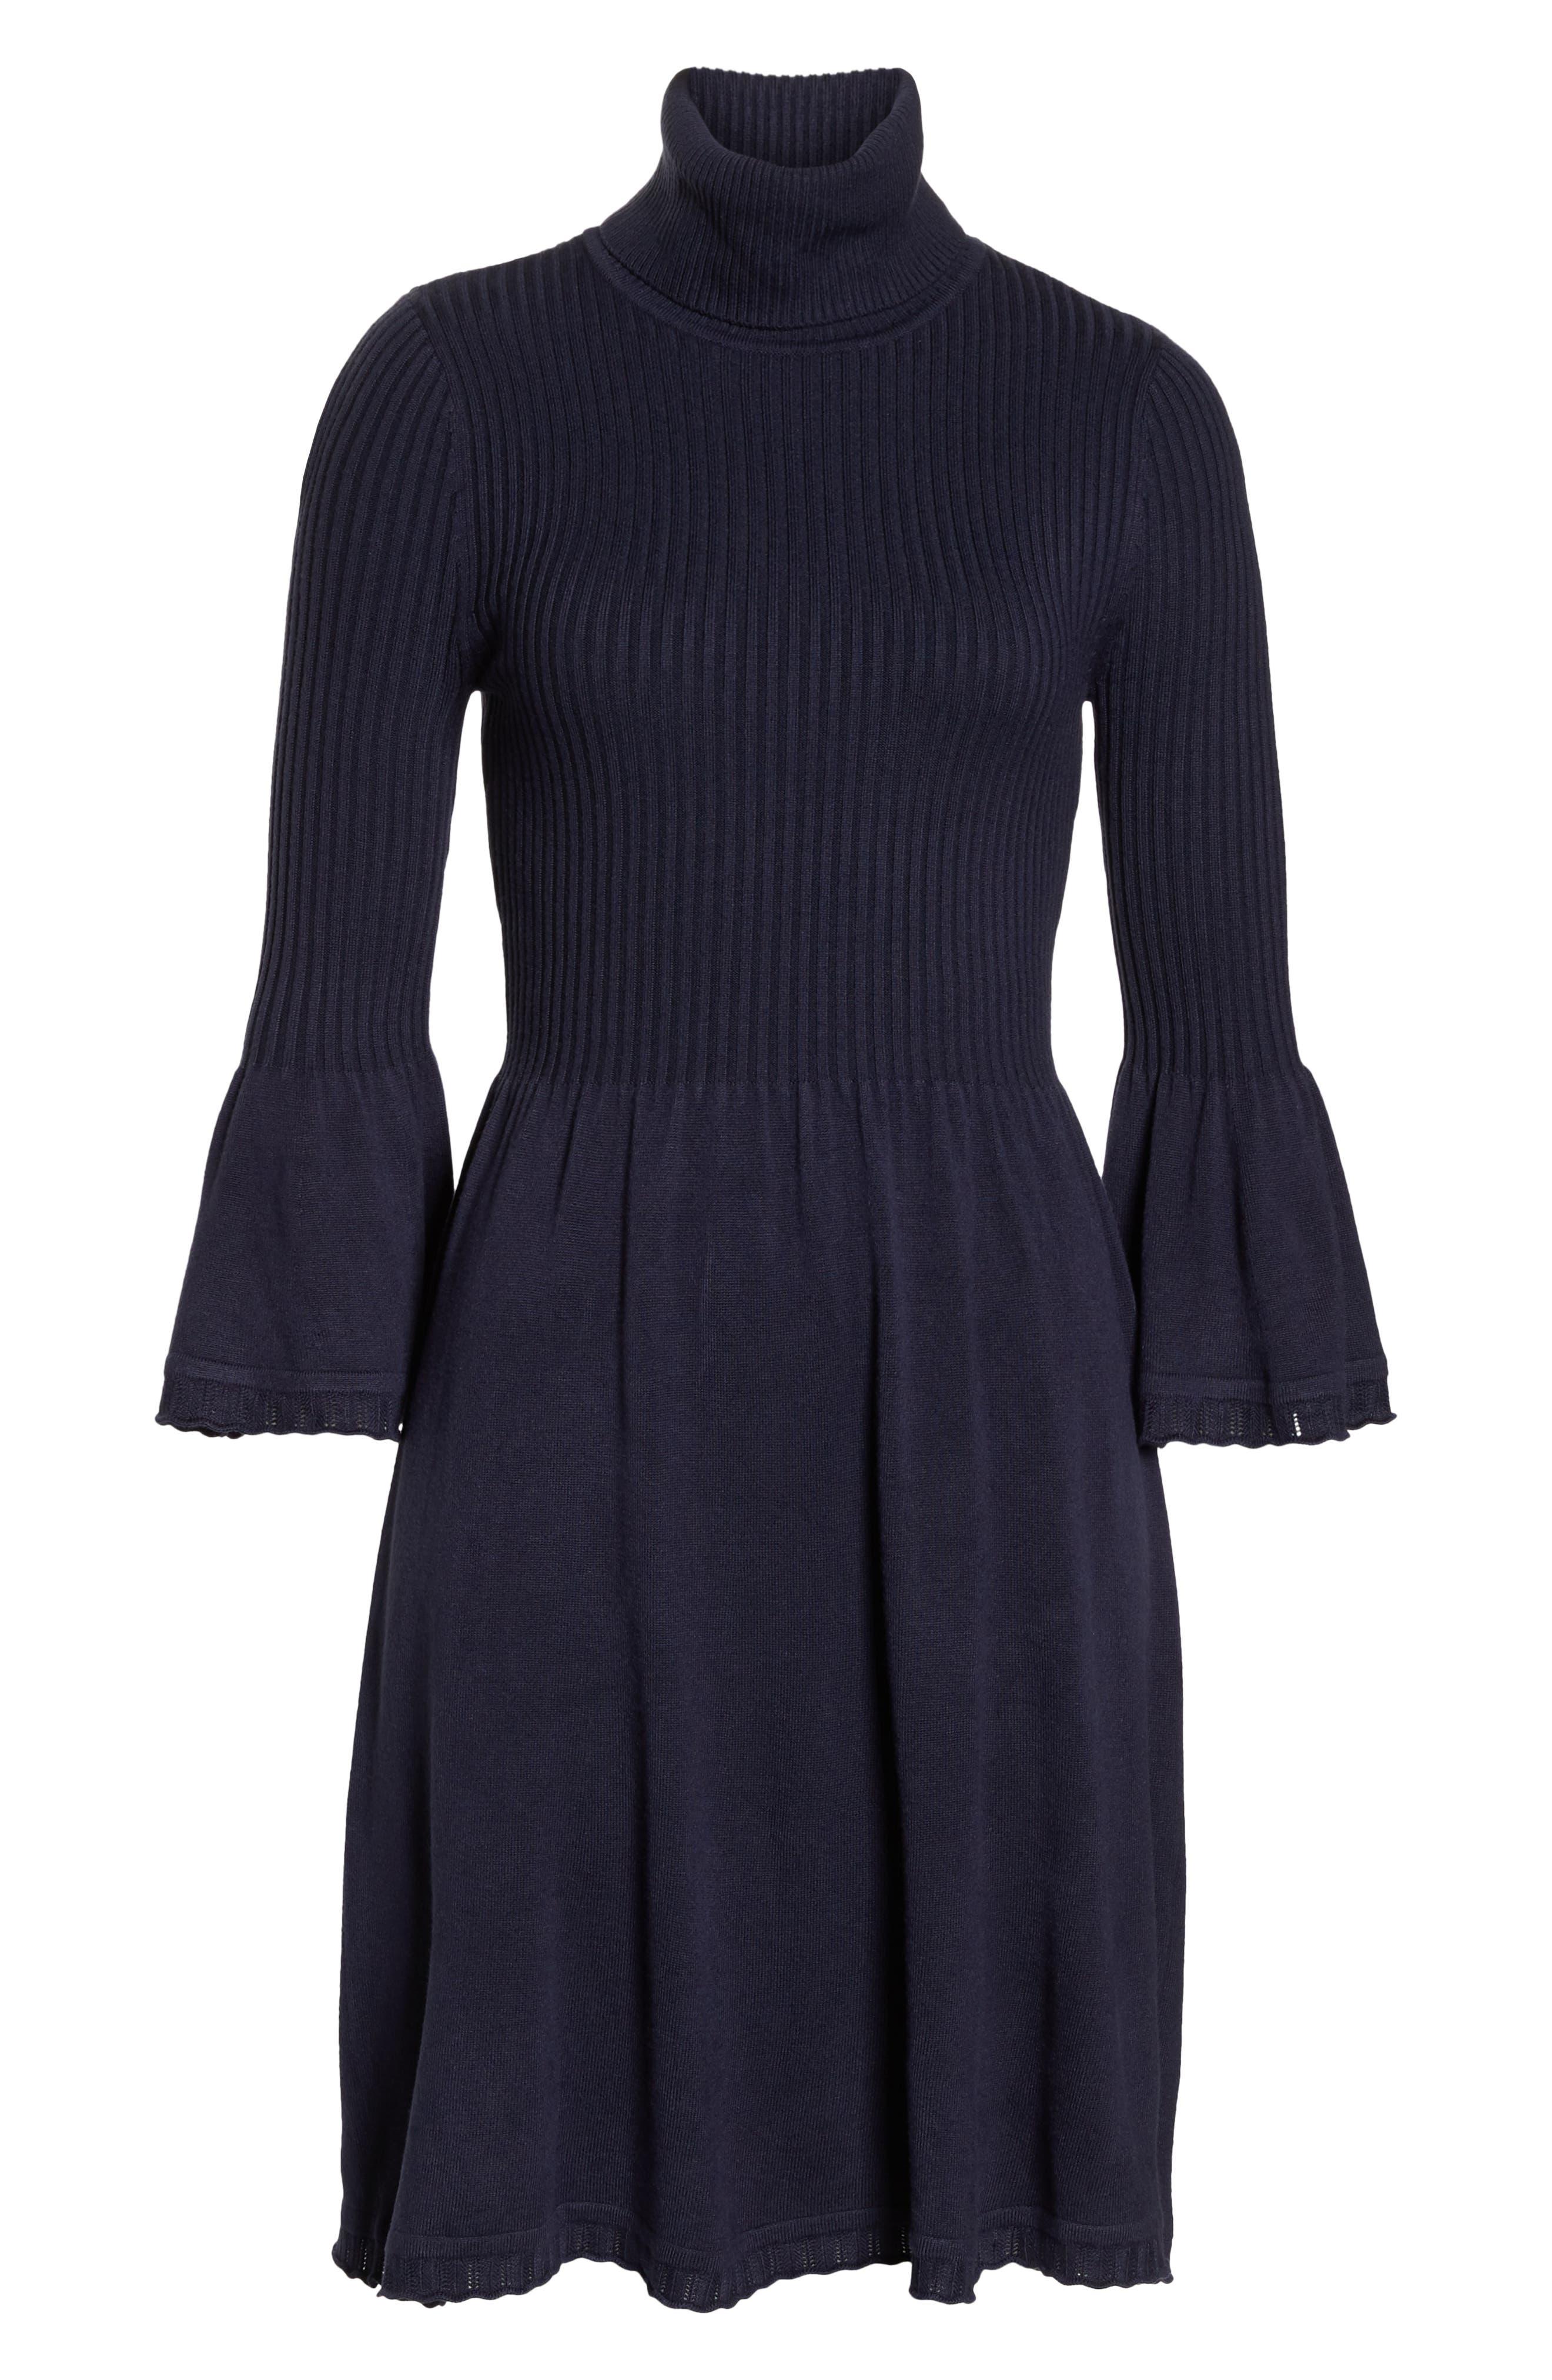 Turtleneck Sweater Dress,                             Alternate thumbnail 7, color,                             NAVY